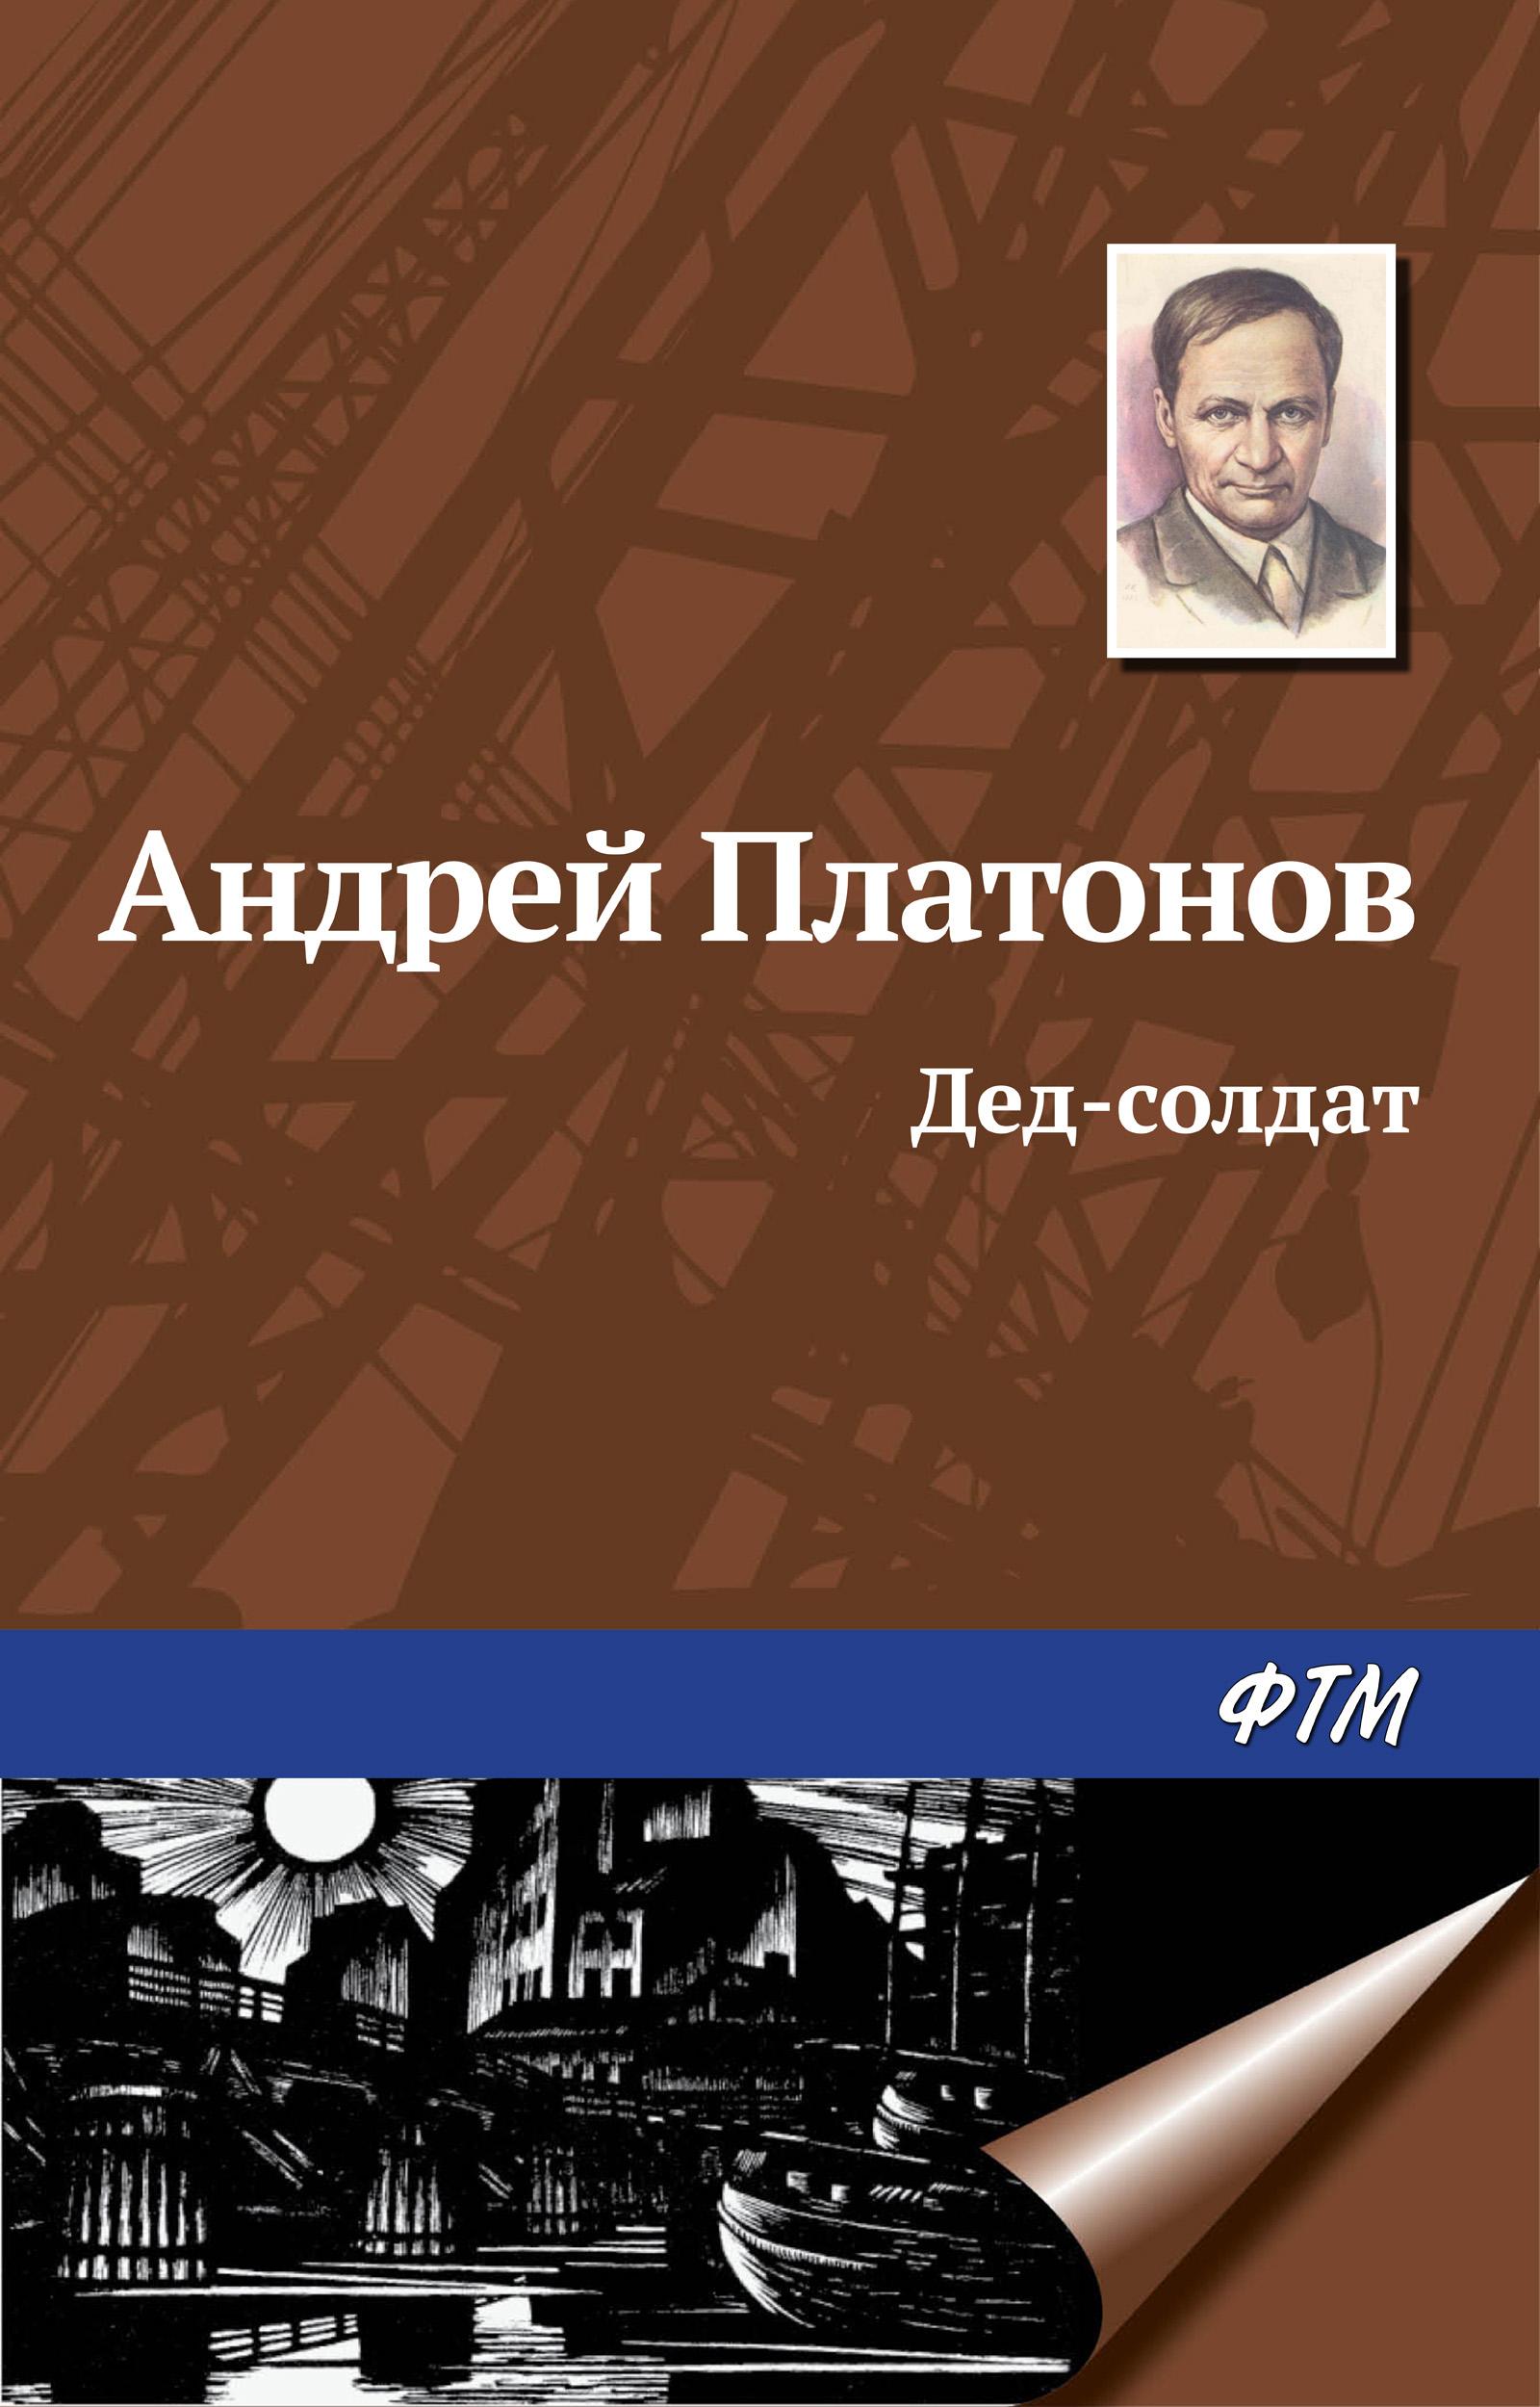 Андрей Платонов Дед-солдат андрей платонов офицер и солдат